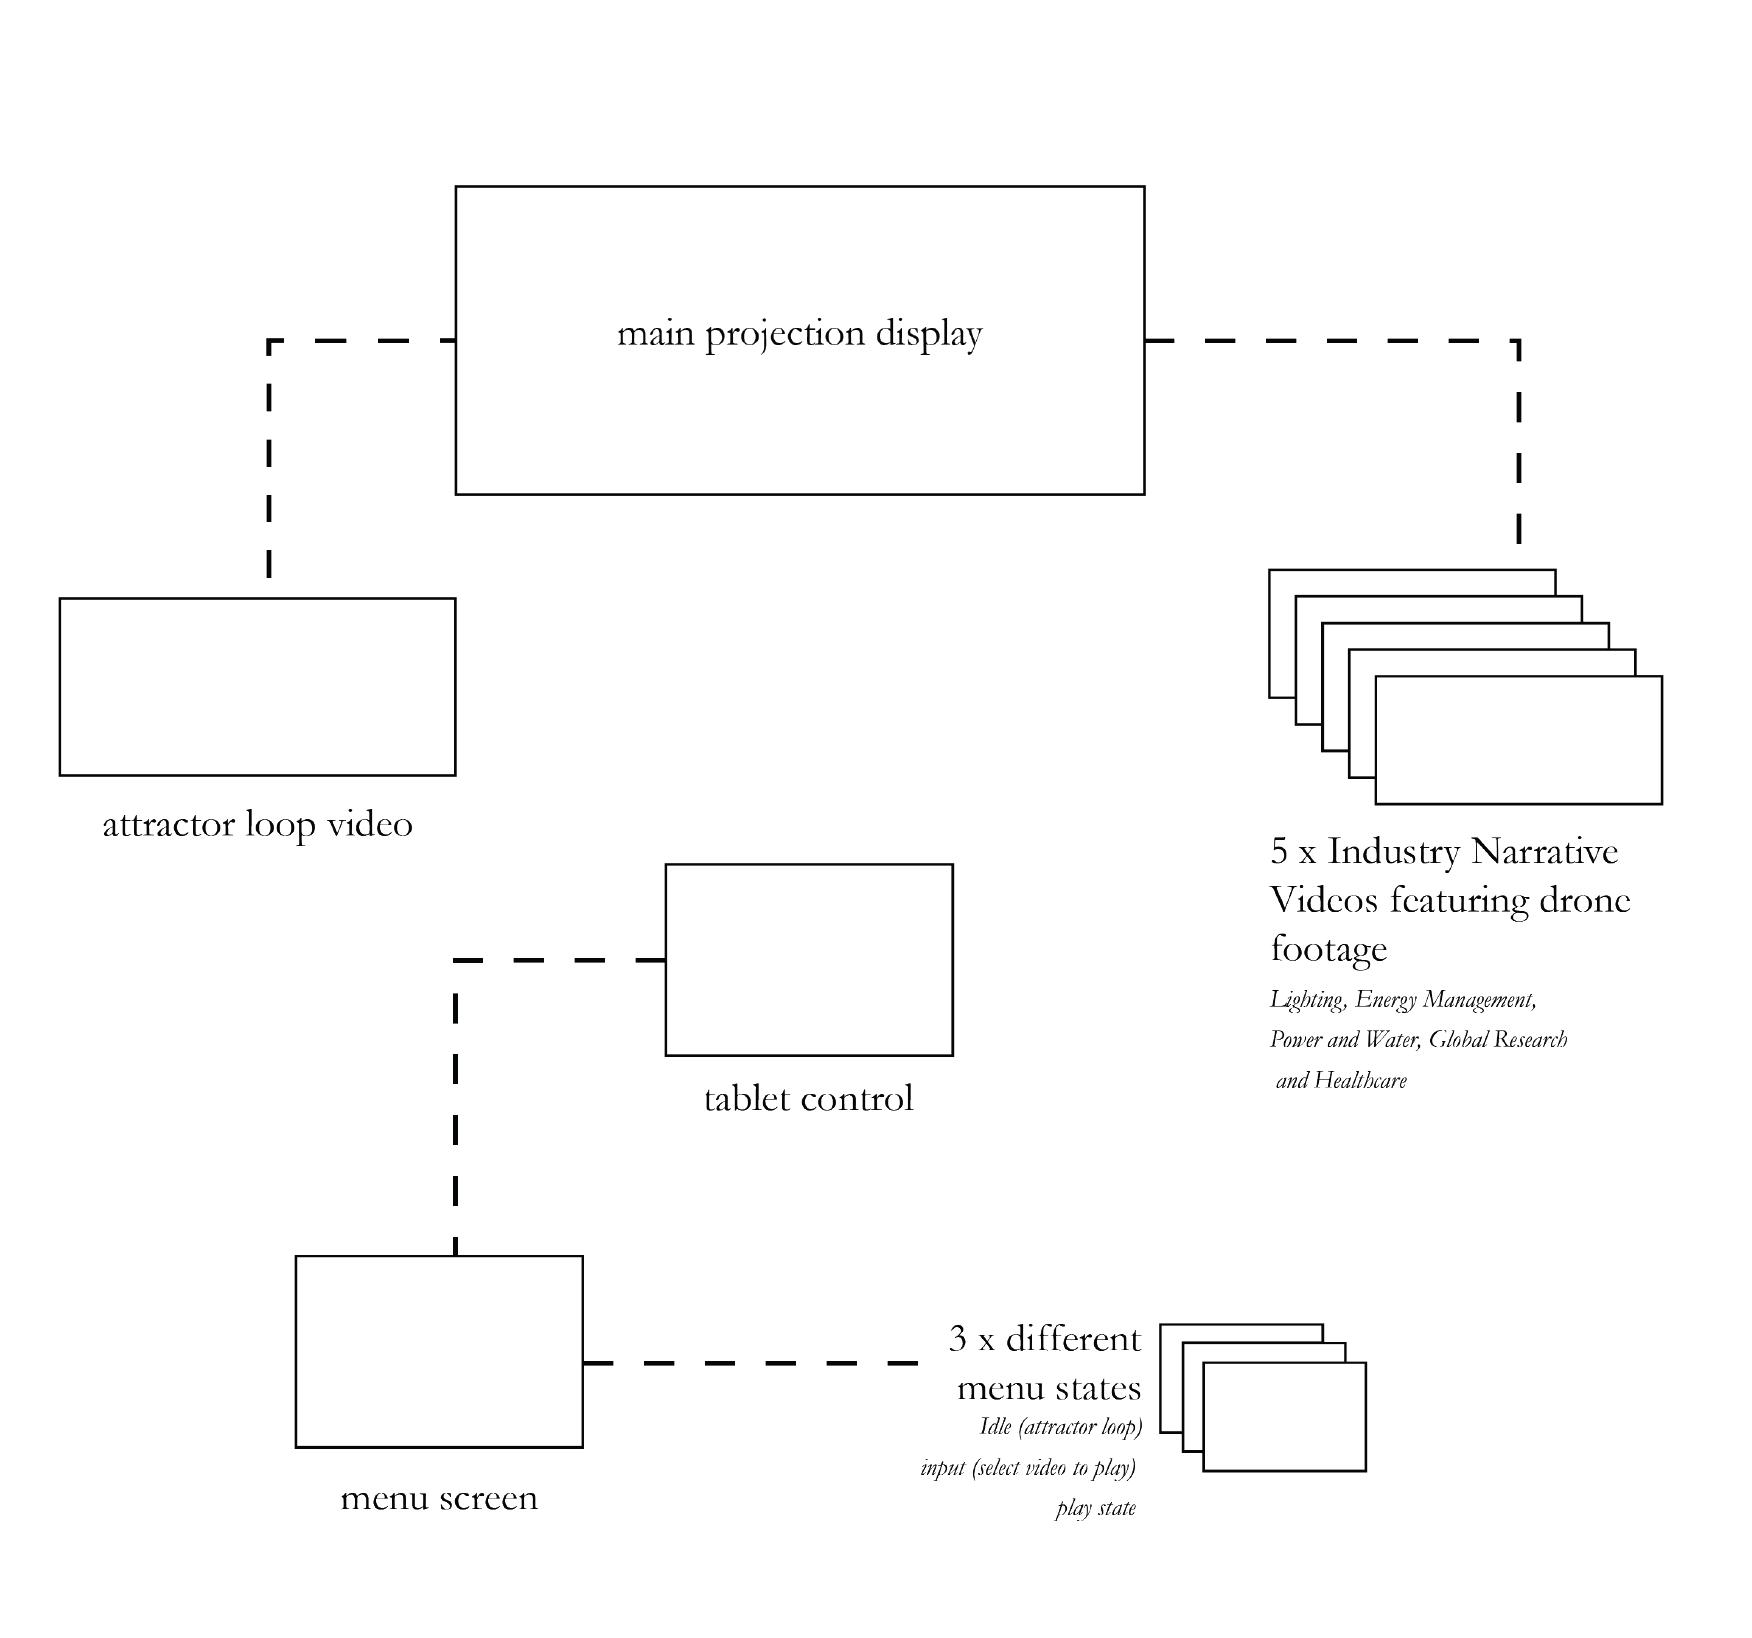 transforming-rio-content-diagram.png